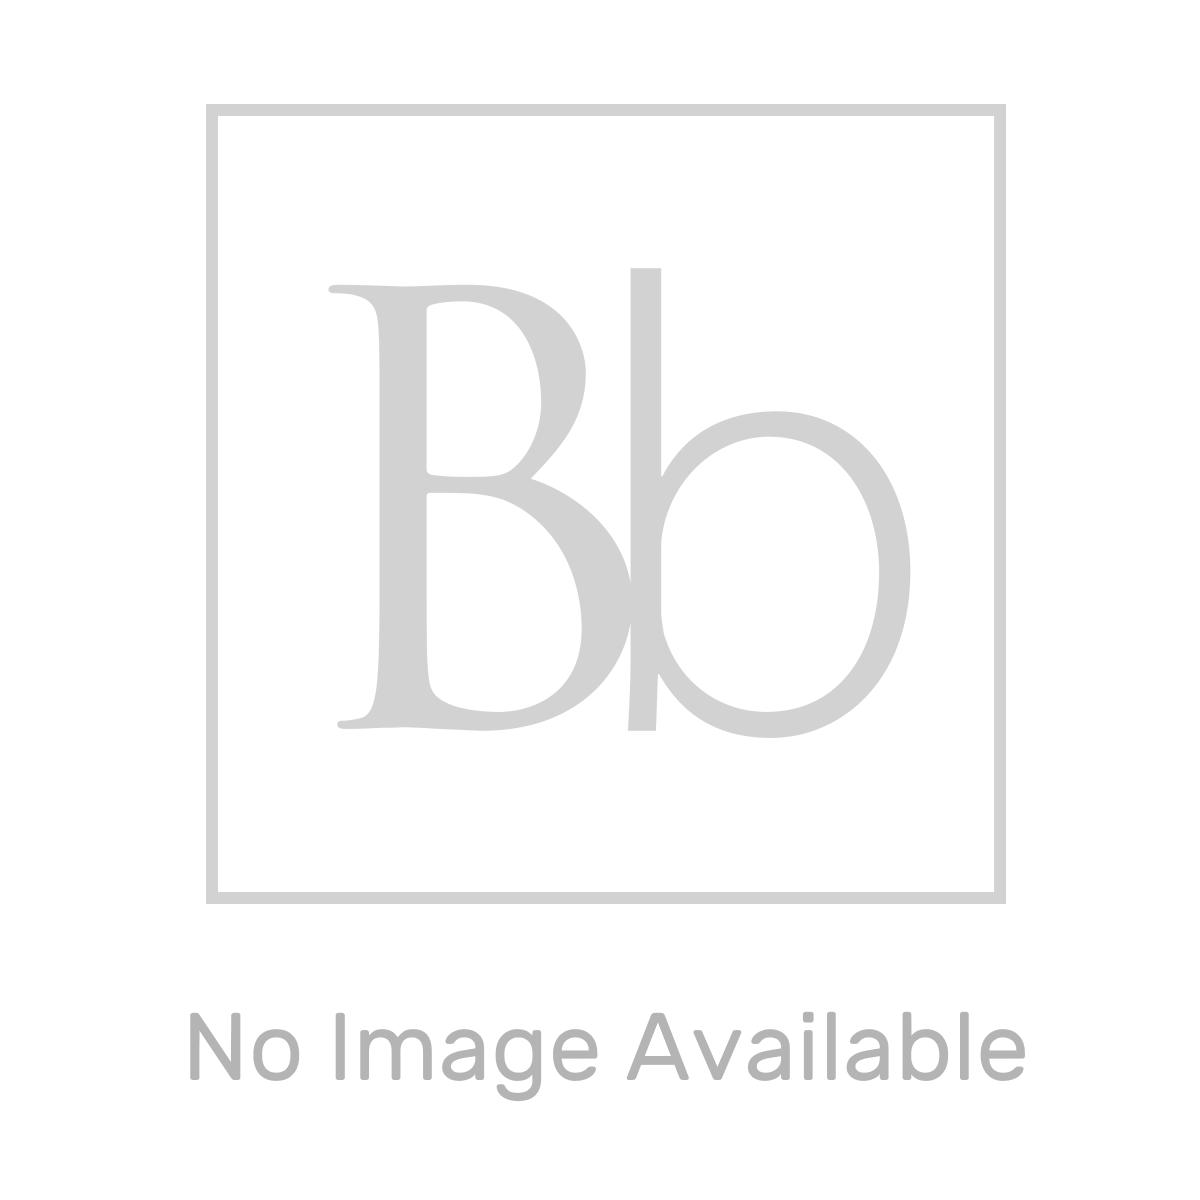 Premier 1 Tap Hole Deluxe Basin